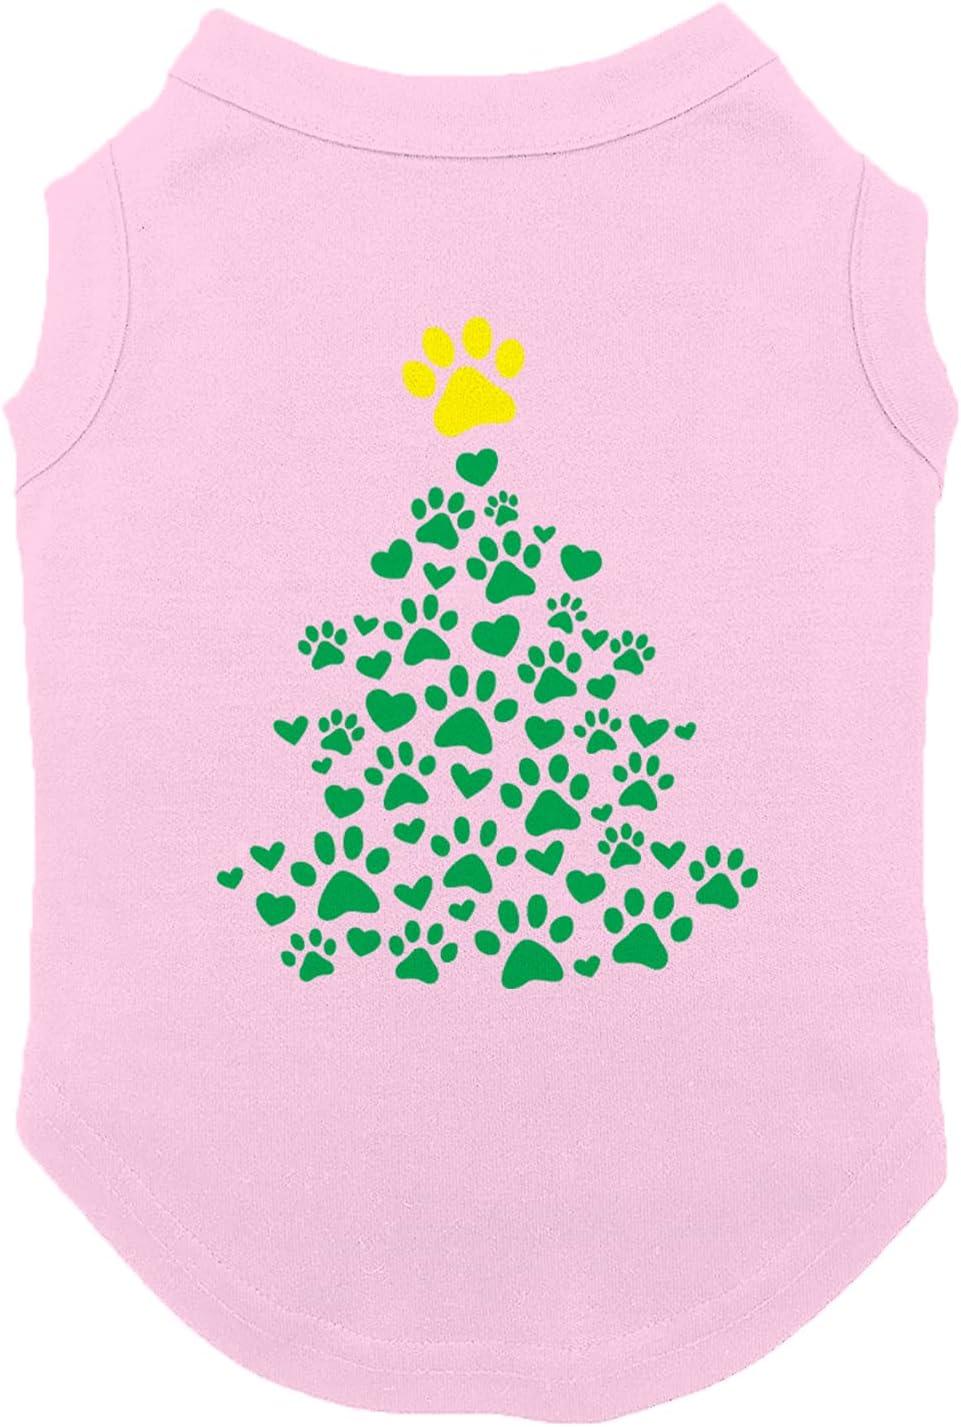 Sale item Paw Print Christmas Tree - New Shipping Free Adorable Shirt Dog Love Xmas Pin Pet